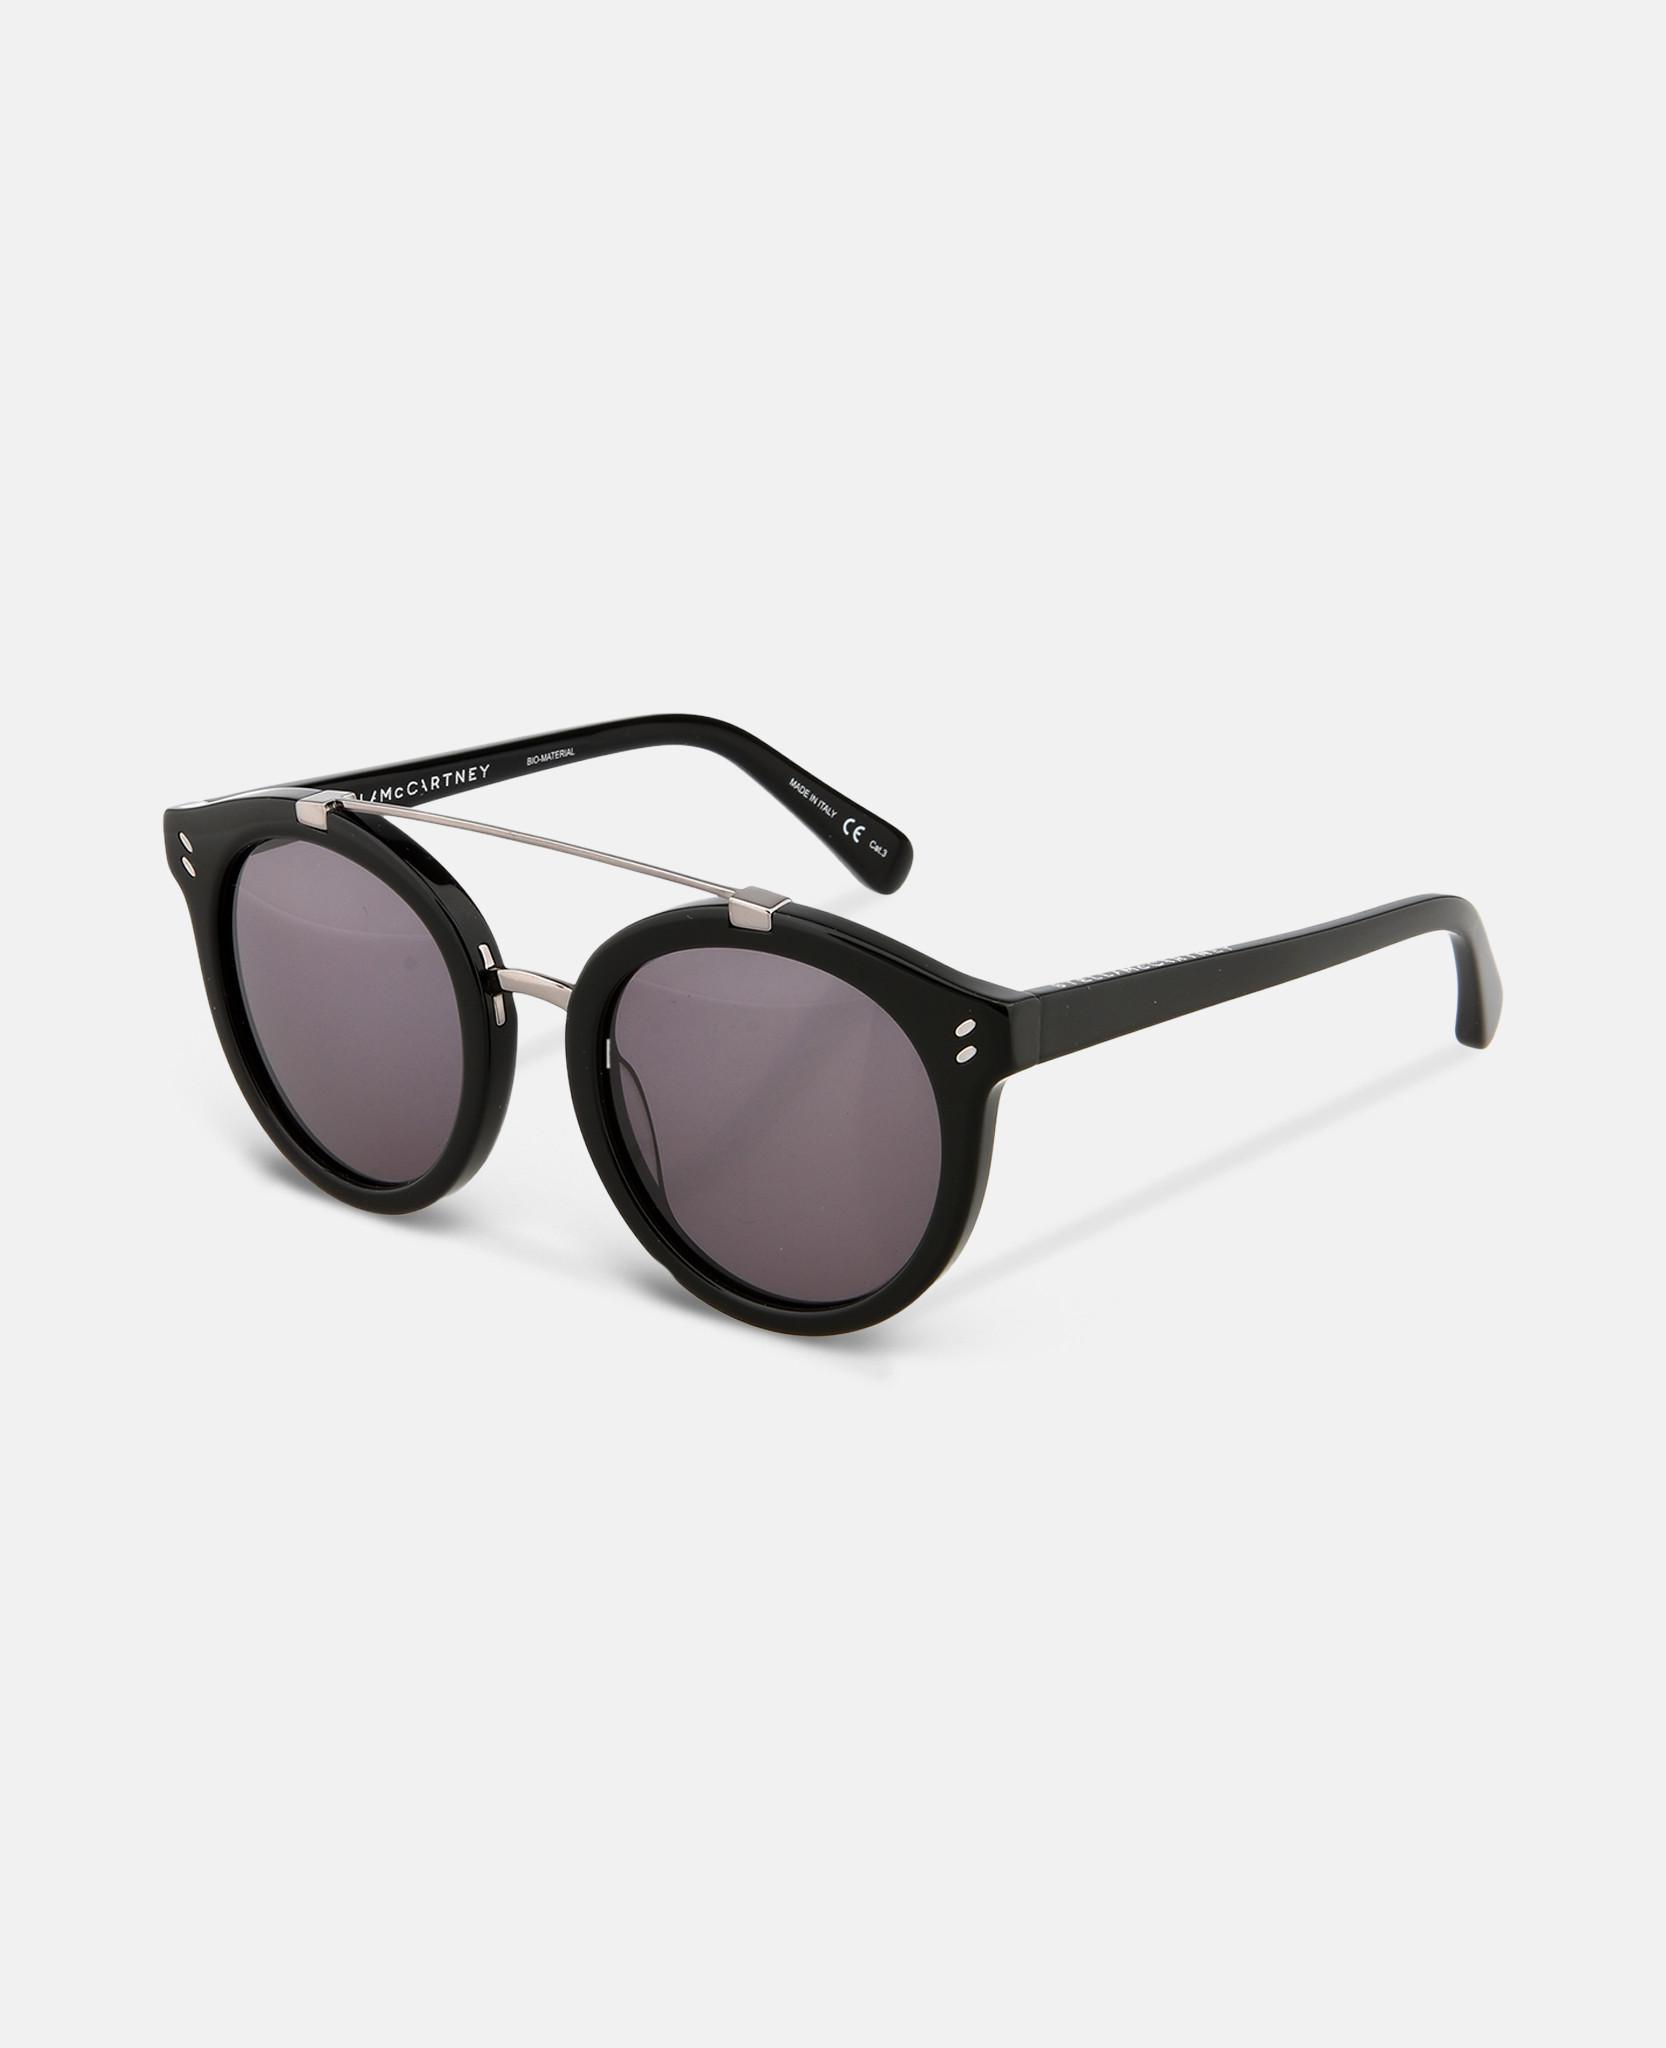 d63d8d93c9 Lyst - Stella Mccartney Black Square Sunglasses in Black